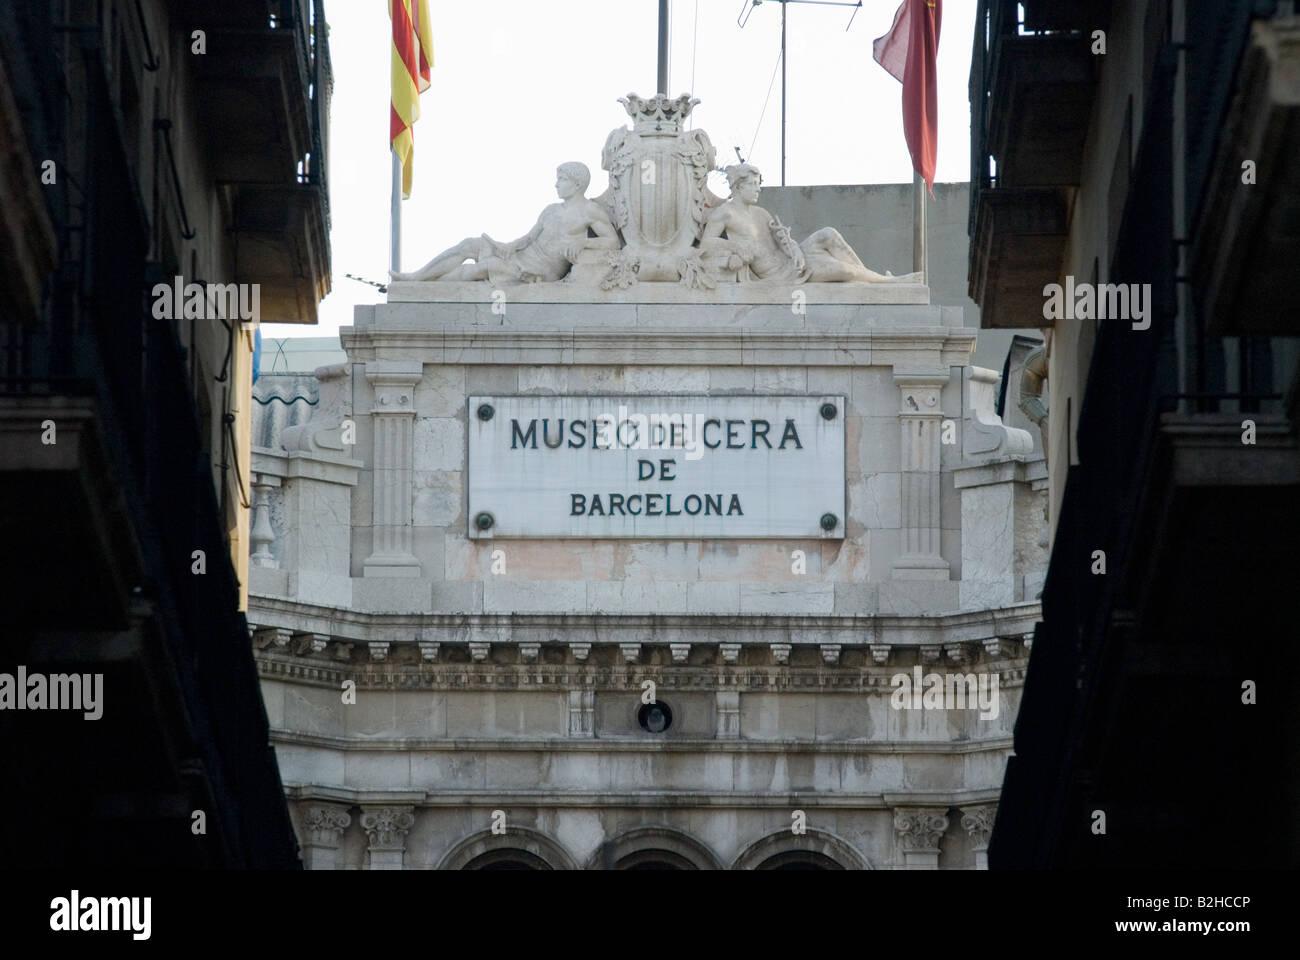 museu cera waxworks museum facade in barcelona Stock Photo